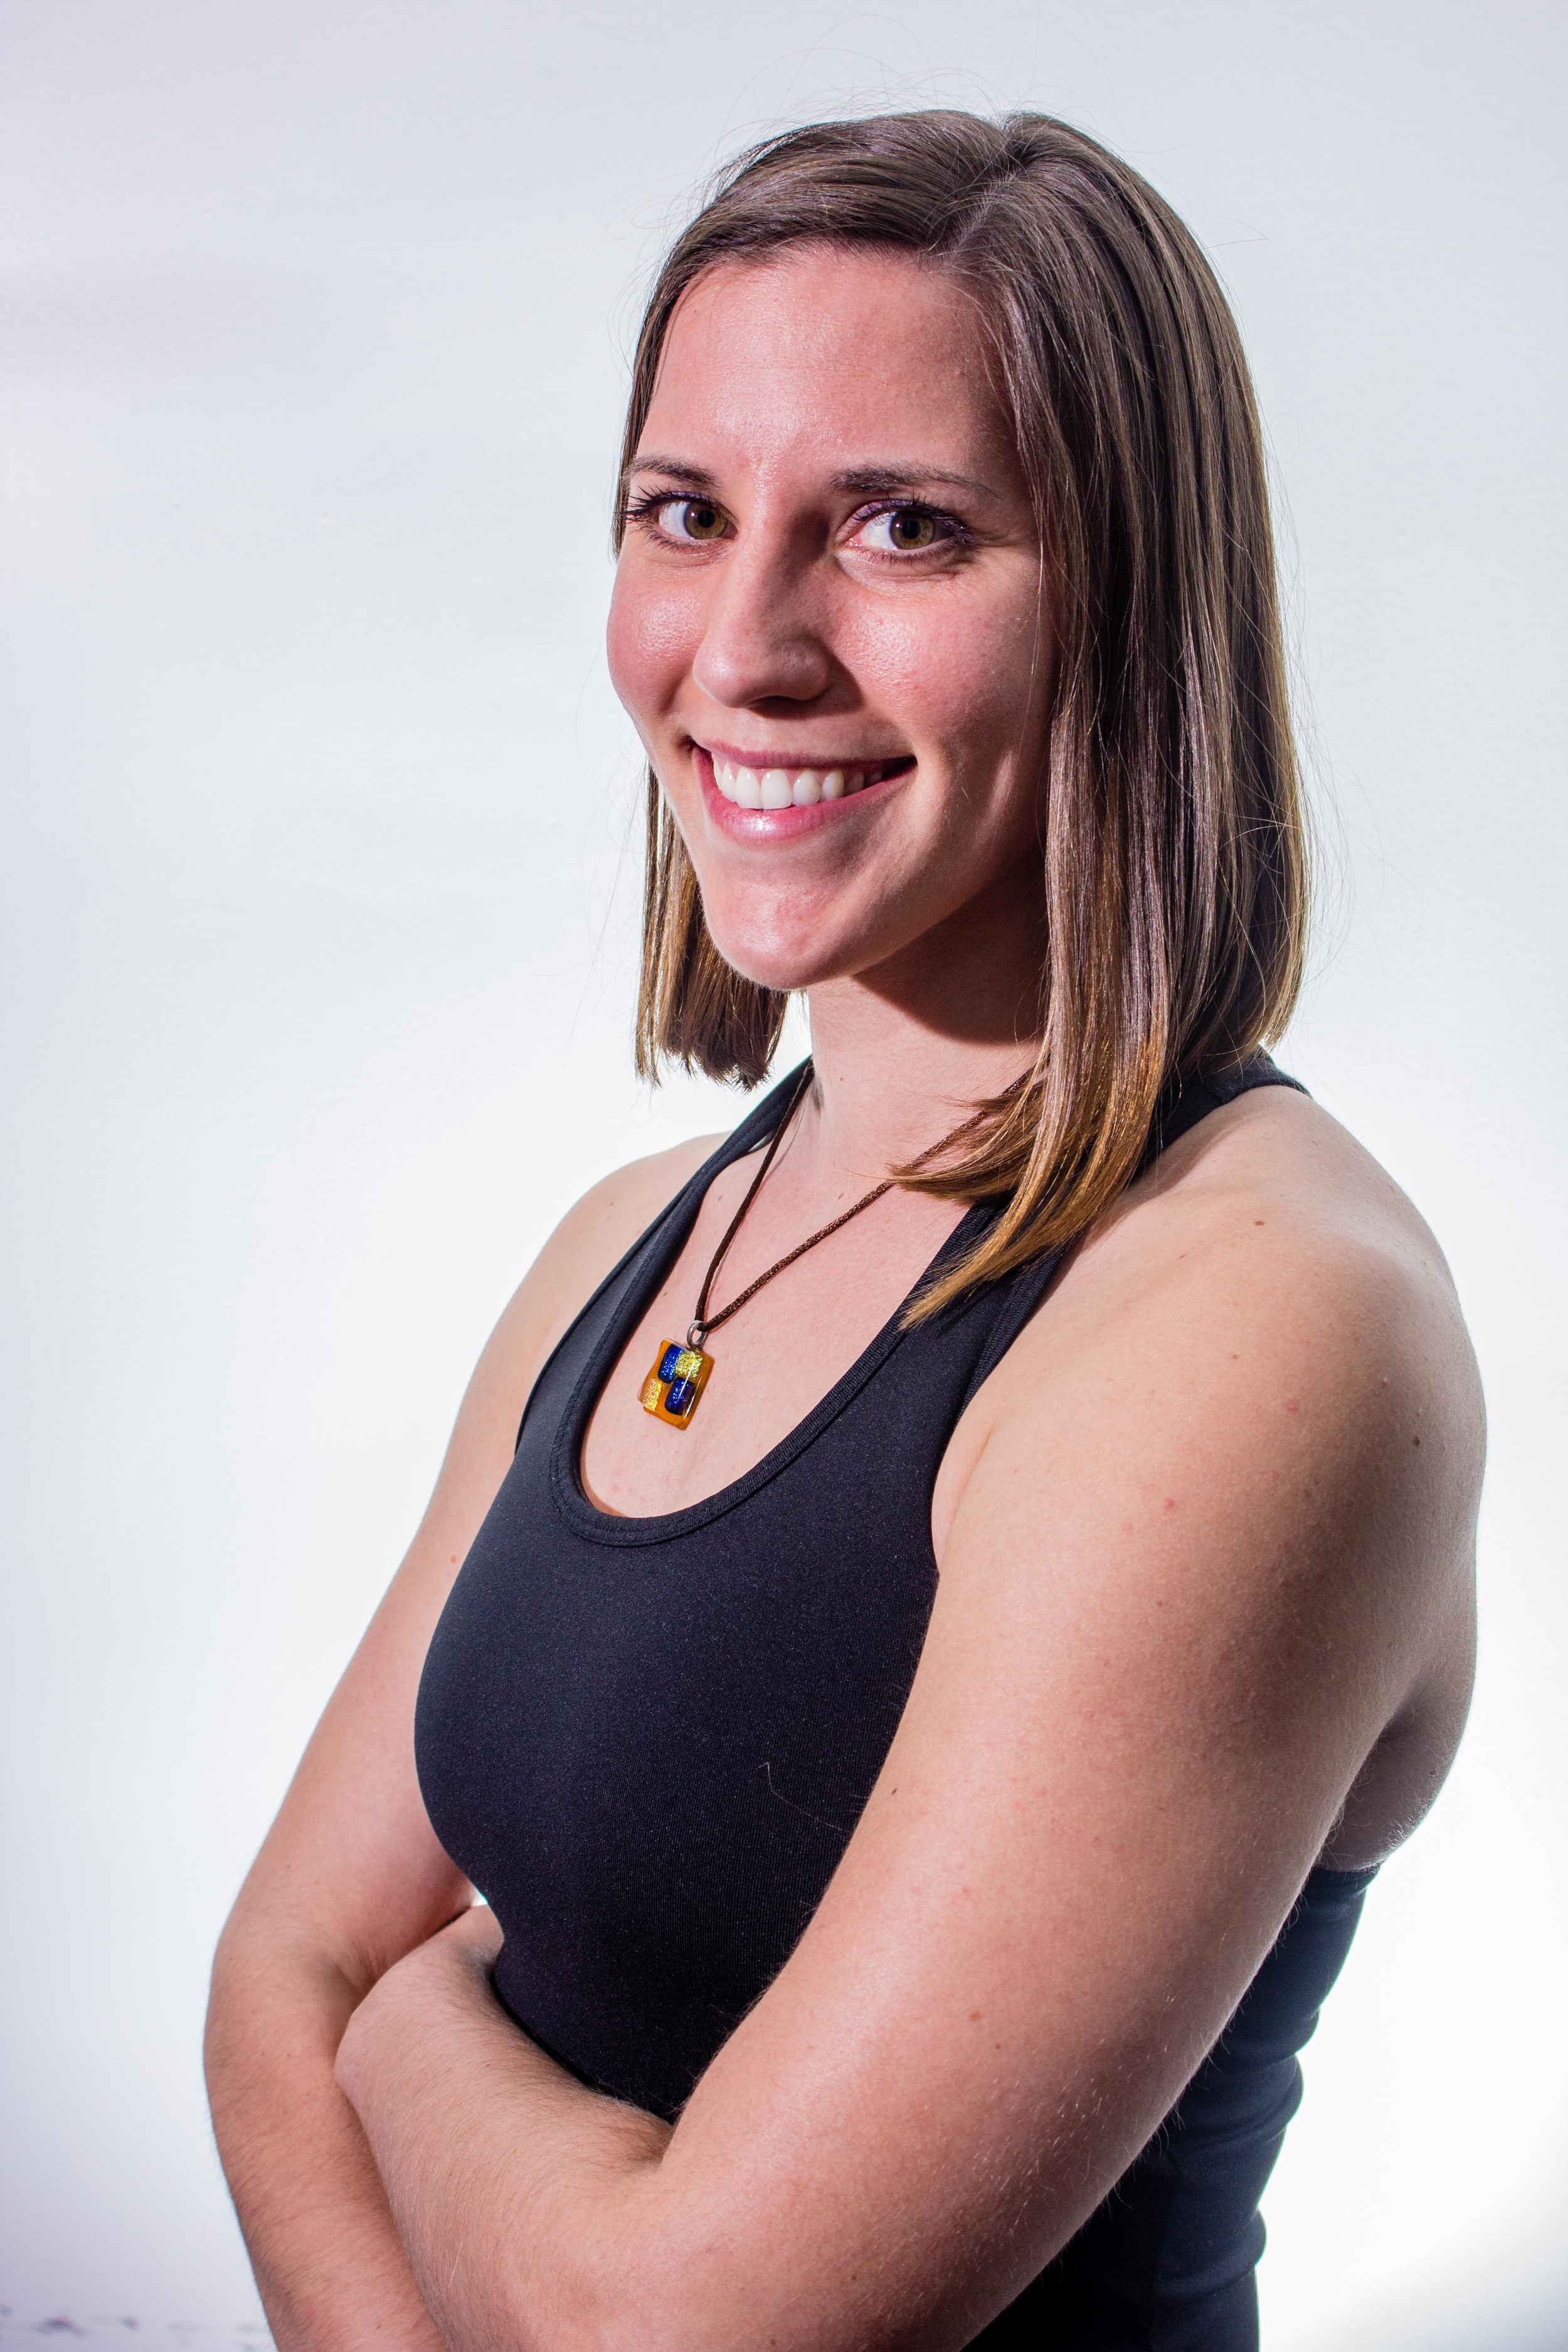 Allie Ricardi, Trainer at The P.E. Club